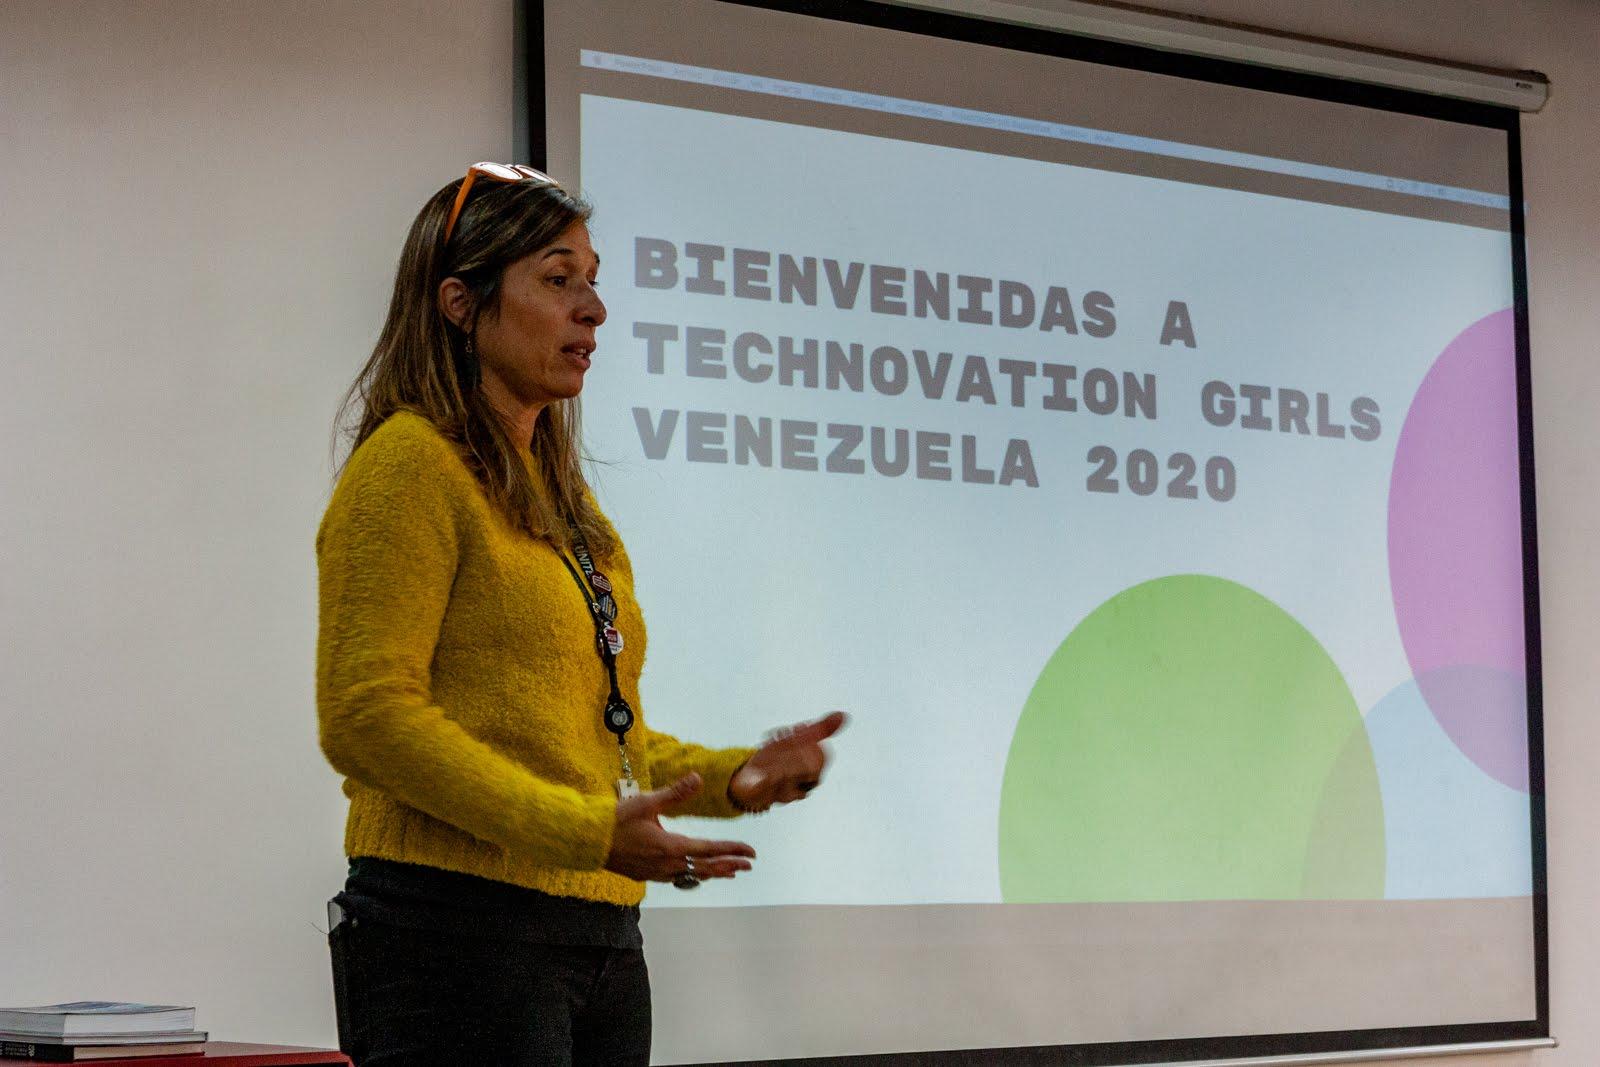 Cuatro equipos representan a Venezuela en semifinales de Technovation Girls